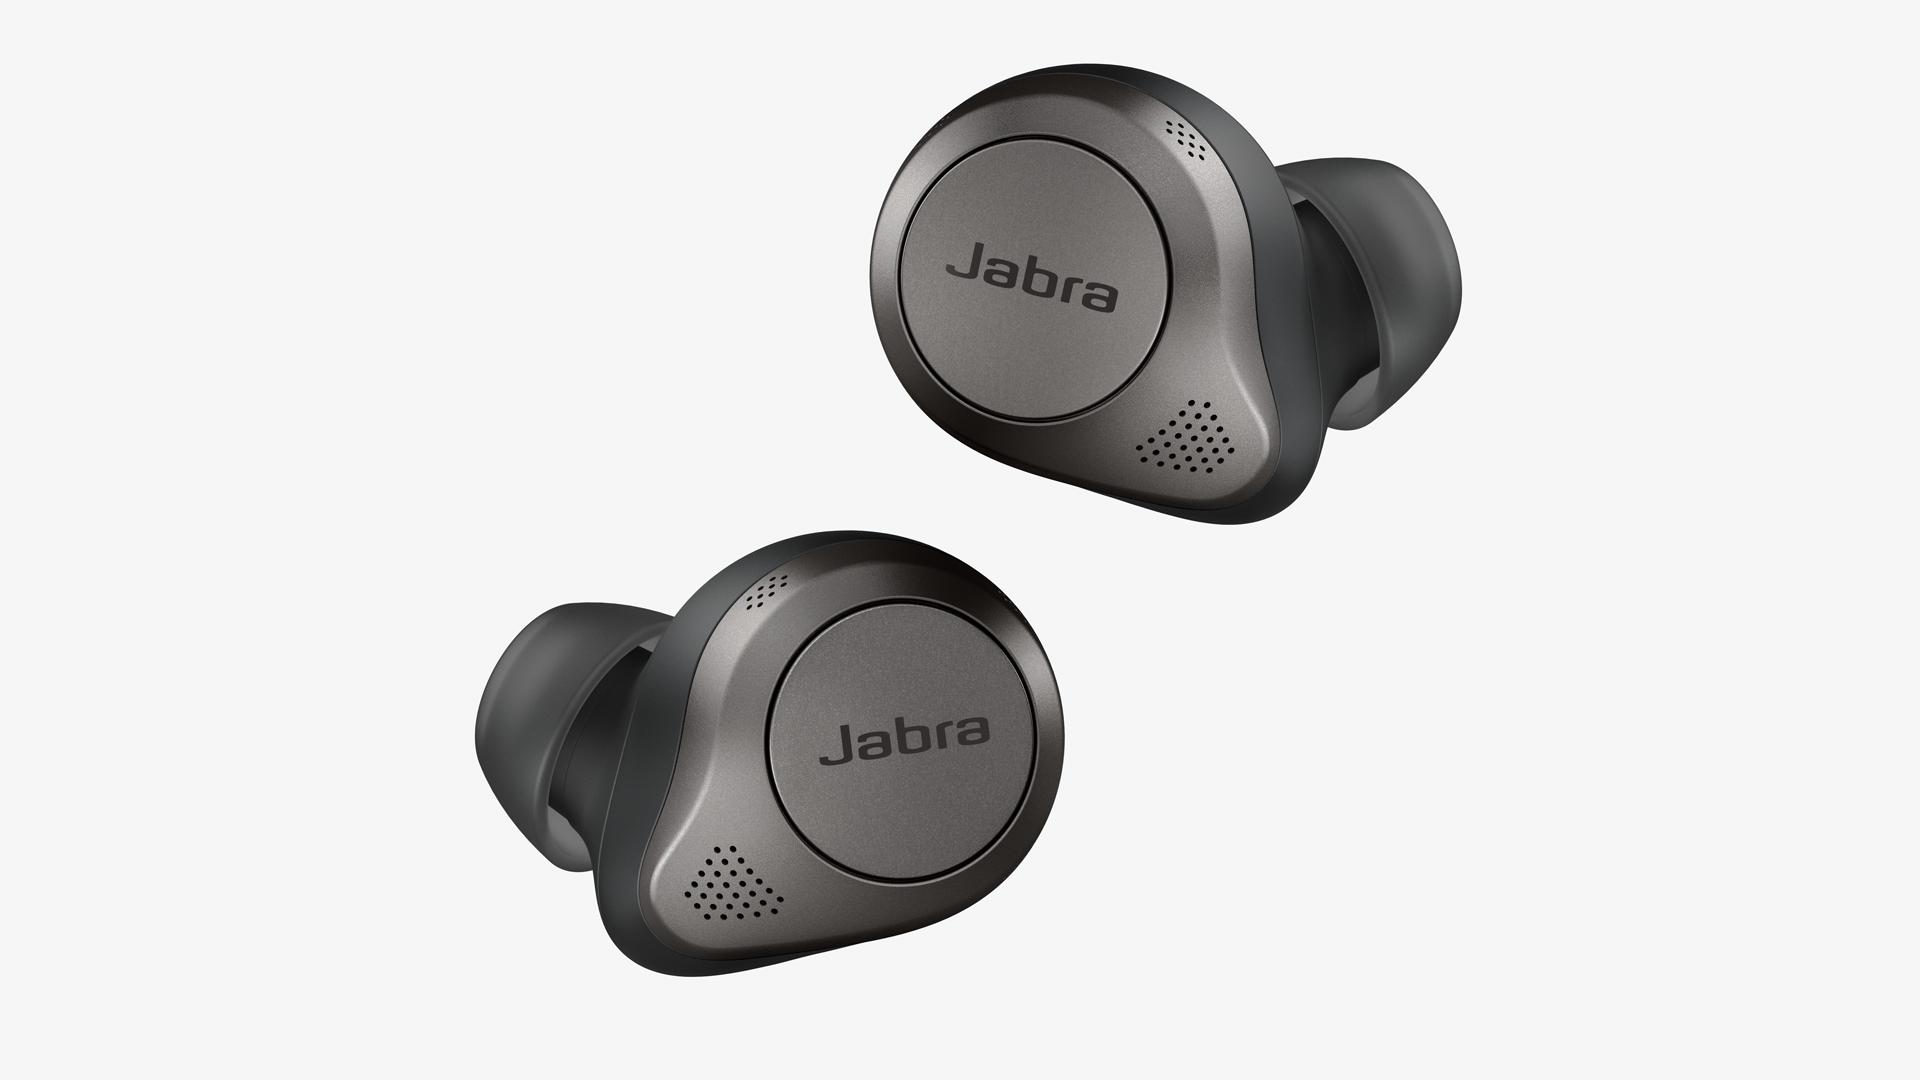 Jabra 85t Headphones